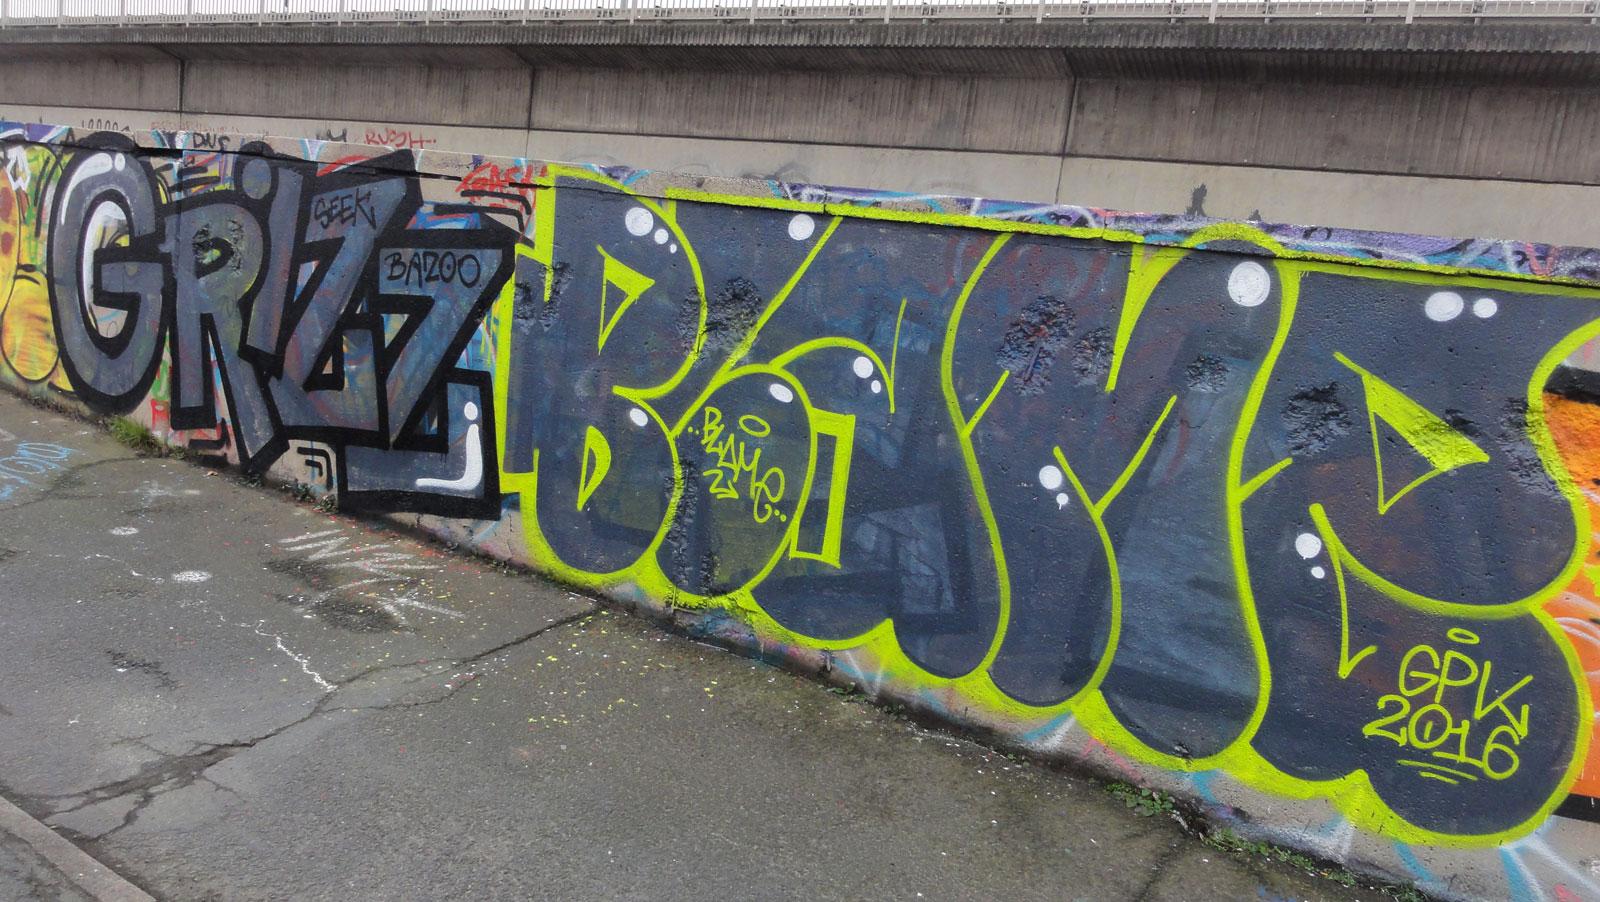 grizz-blame-graffiti-hanauer-landstrasse